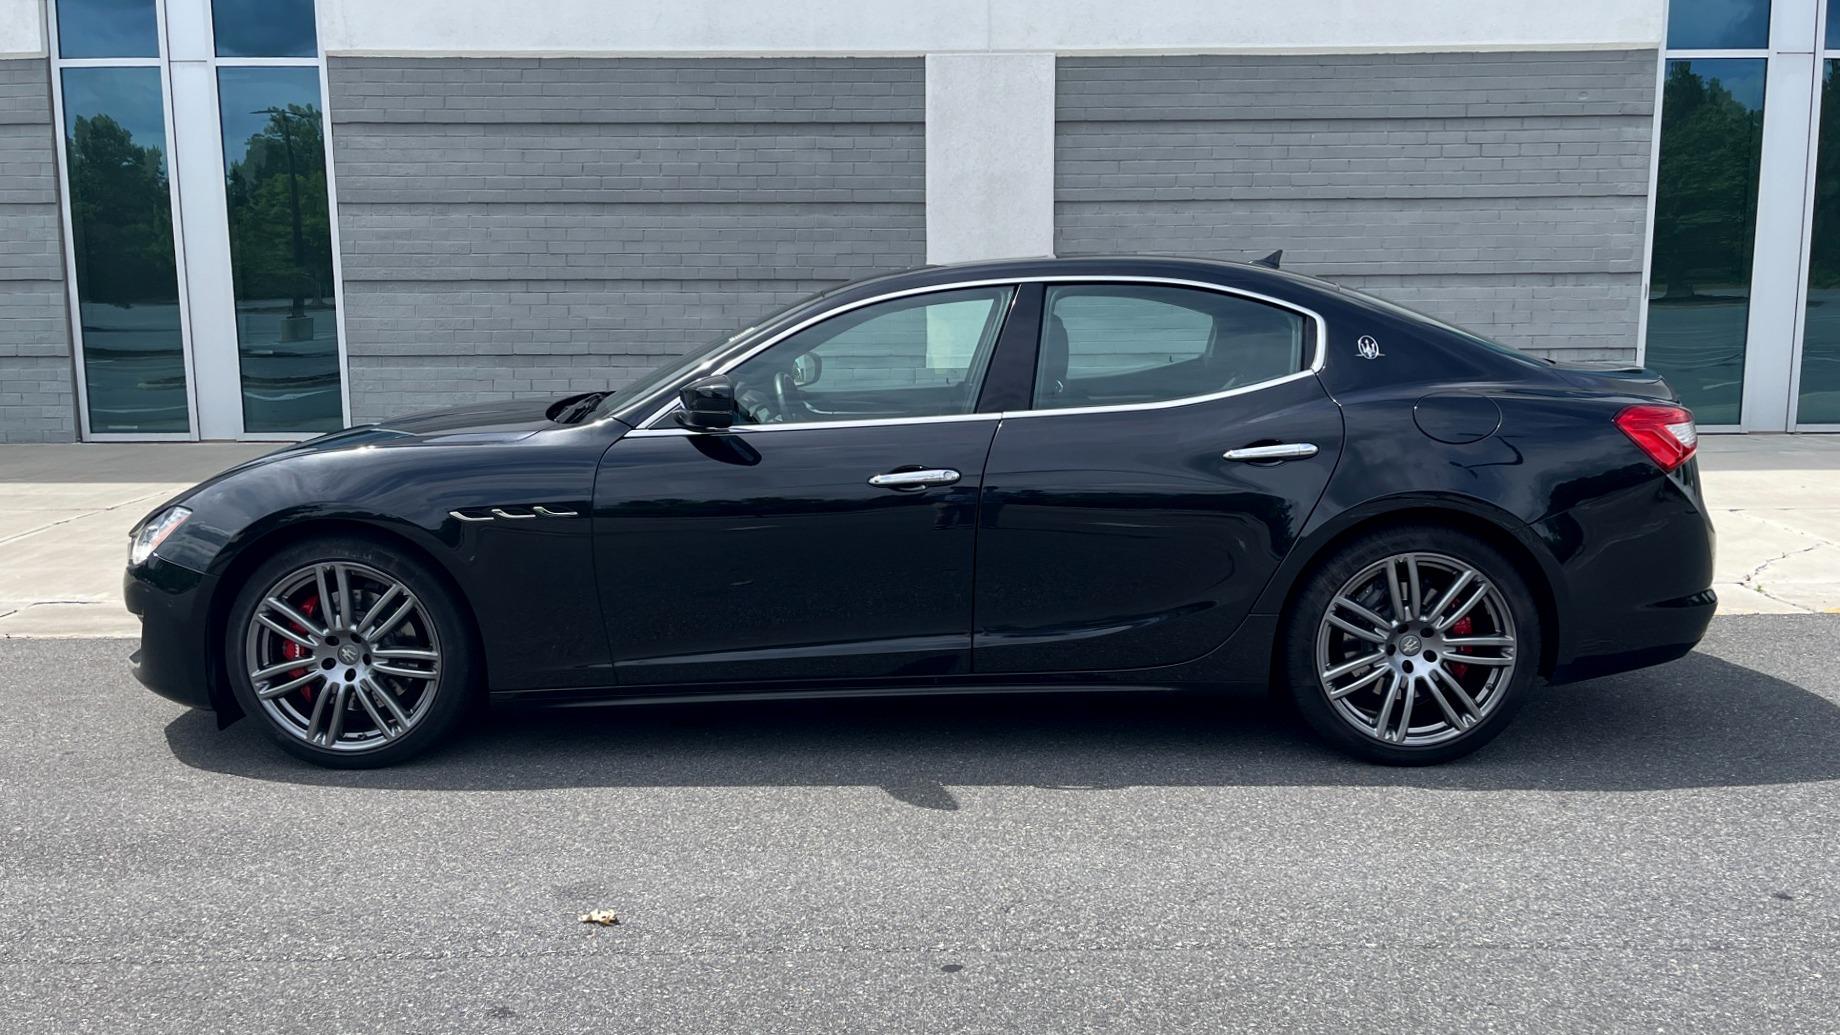 Used 2018 Maserati GHIBLI S Q4 SEDAN / AWD / 3.0L V6 / SUNROOF / NAV / REARVIEW for sale $51,995 at Formula Imports in Charlotte NC 28227 3